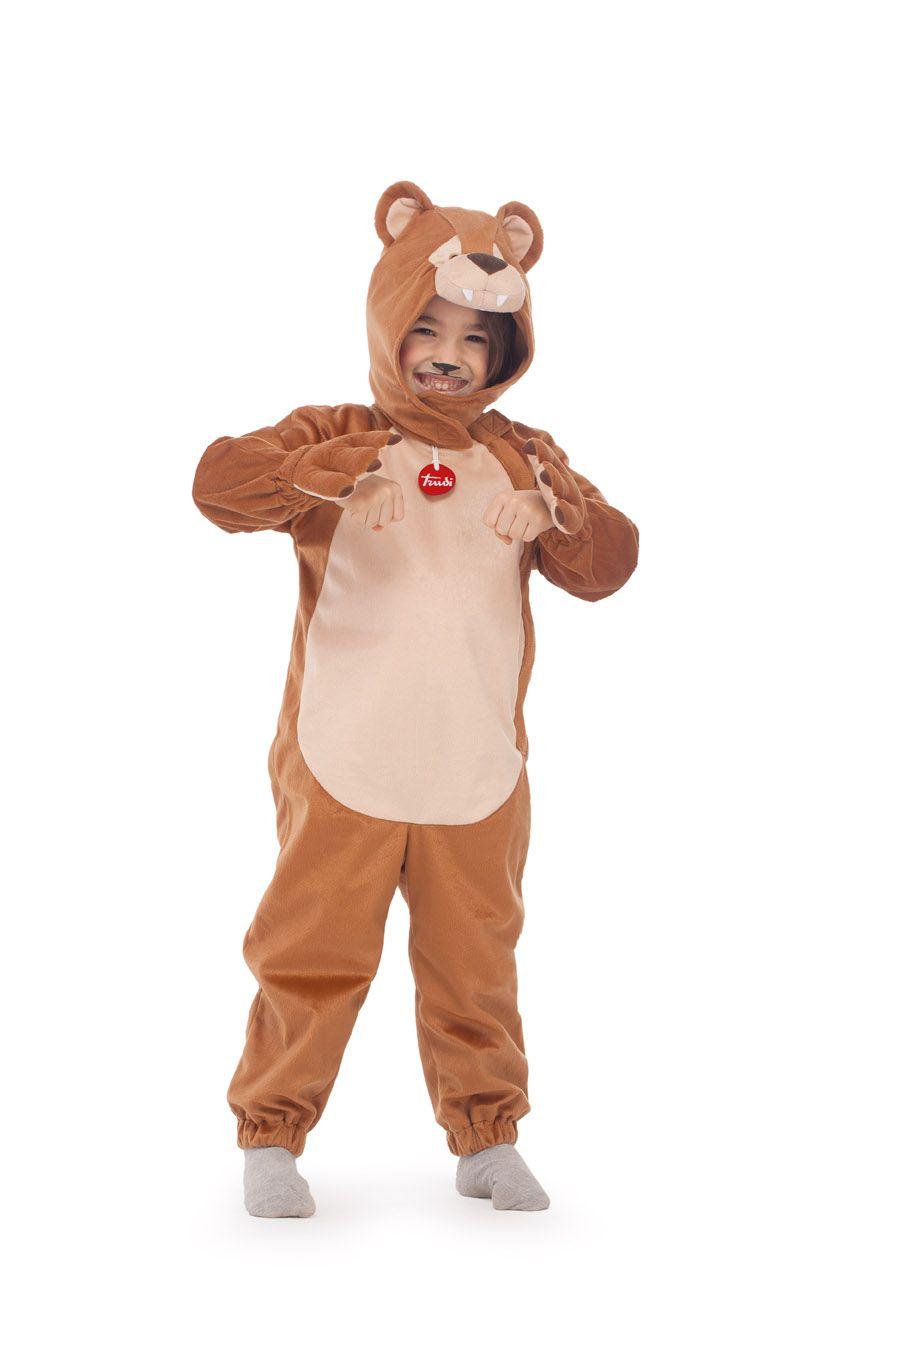 Trudi Carnival - The Bear Costumi Di Carnevale 57767c7a2e9